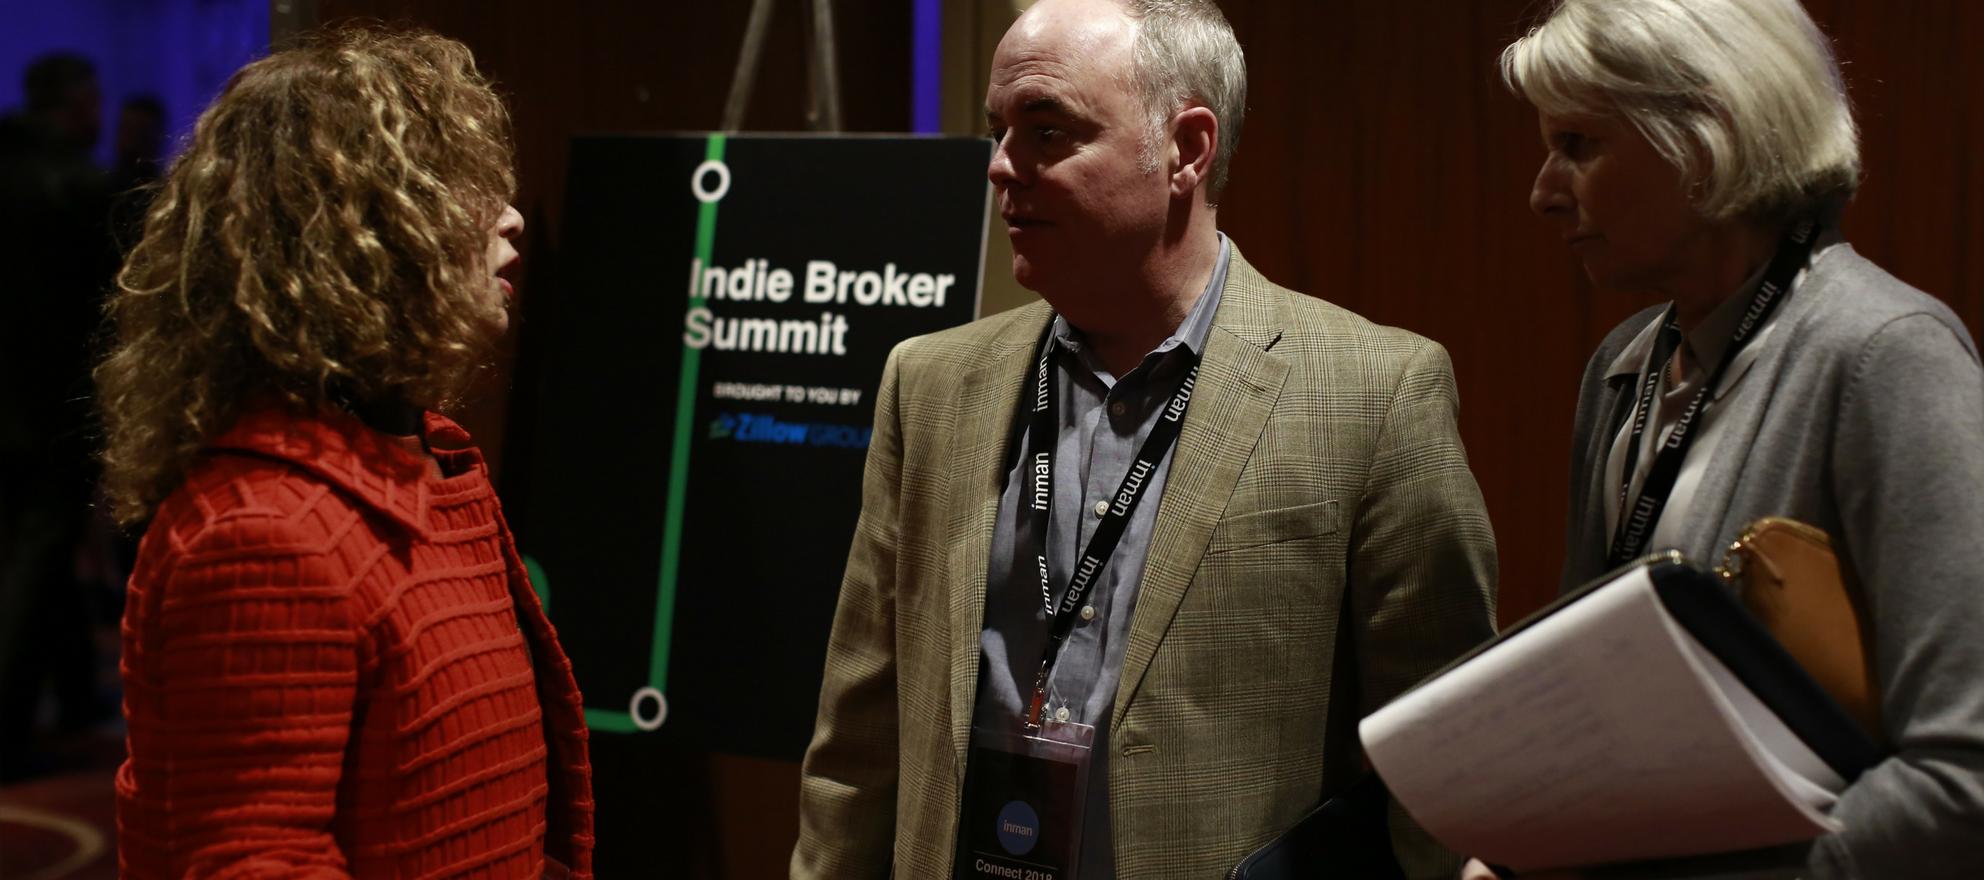 inman connect new york 2018 Indie broker summit Cynthia Lippert